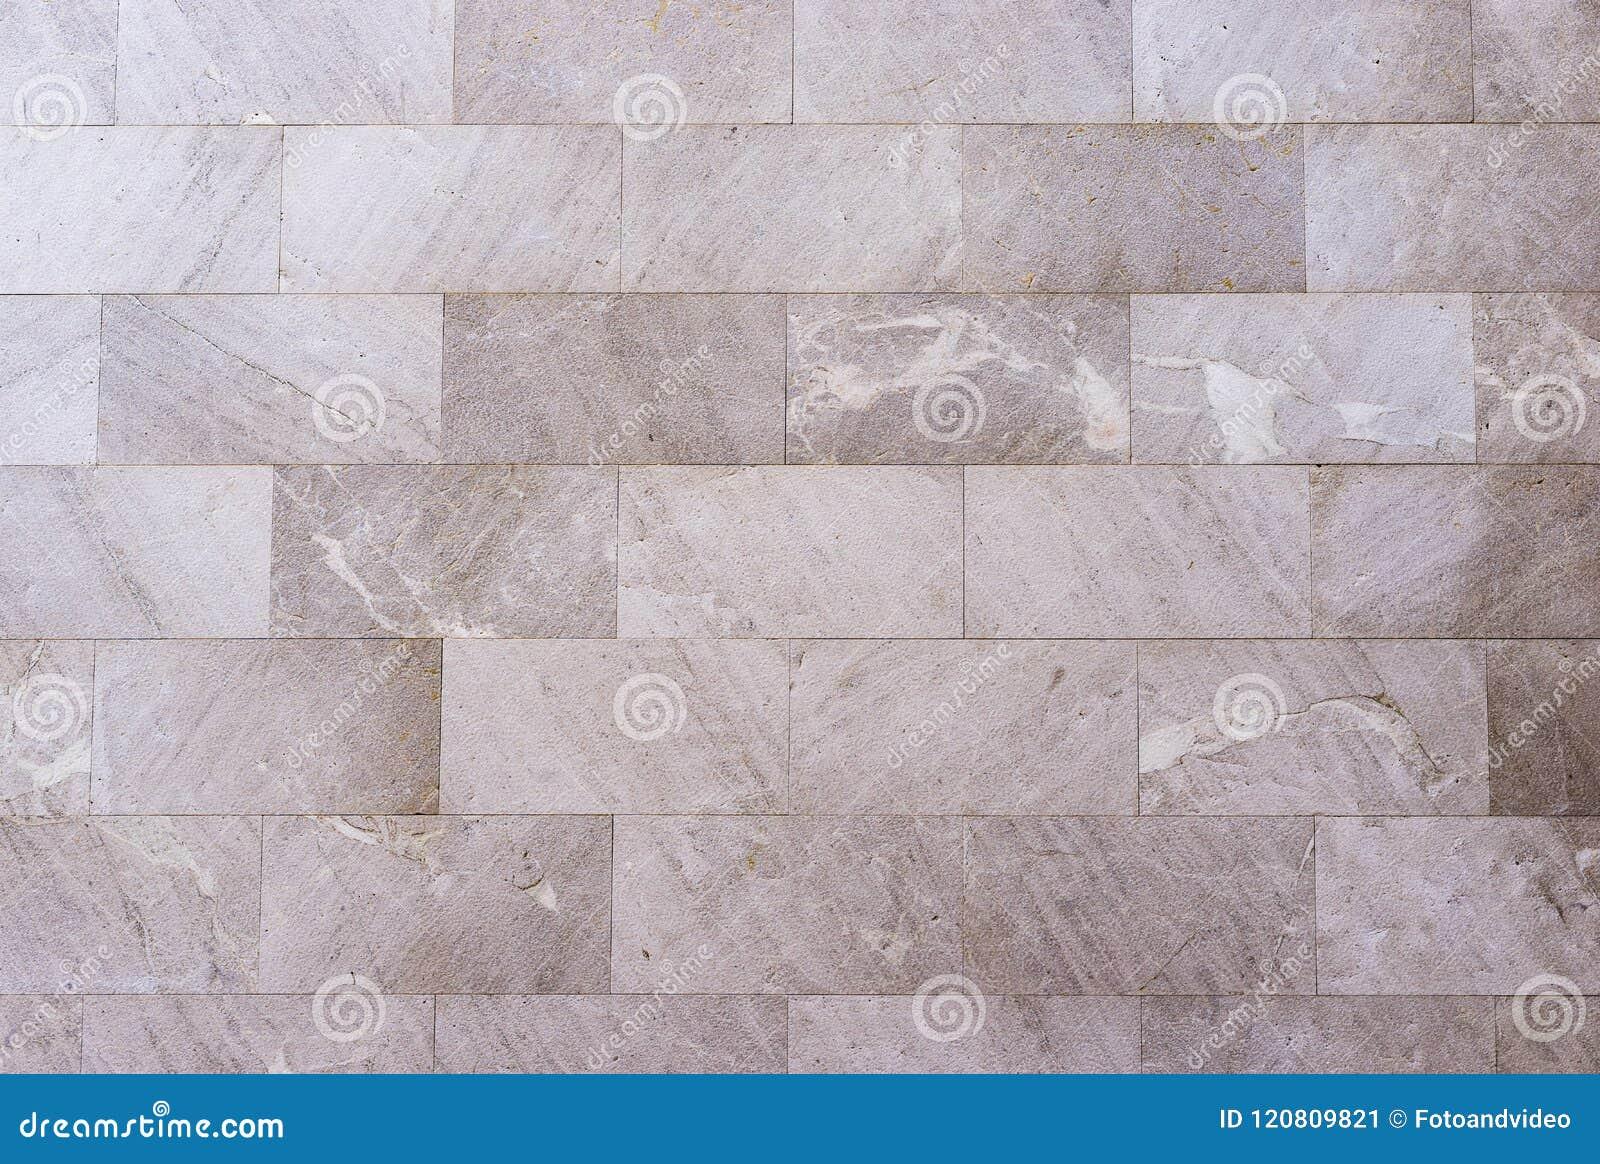 Modern Grey Stone Tiles Background Texture Stock Image Image Of Grey Element 120809821